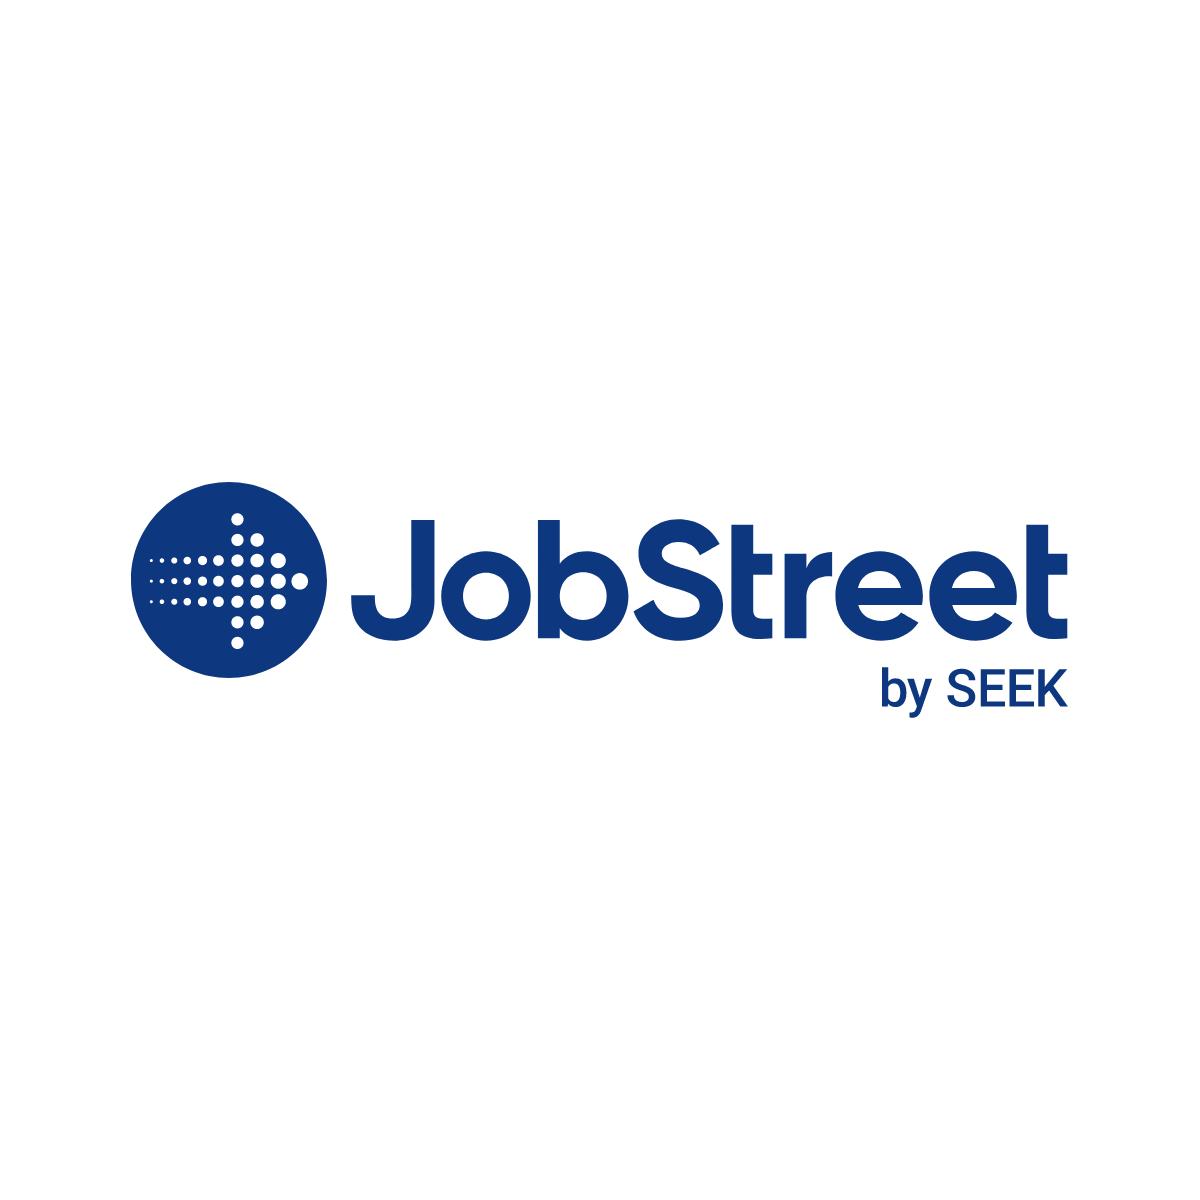 www.jobstreet.com.sg